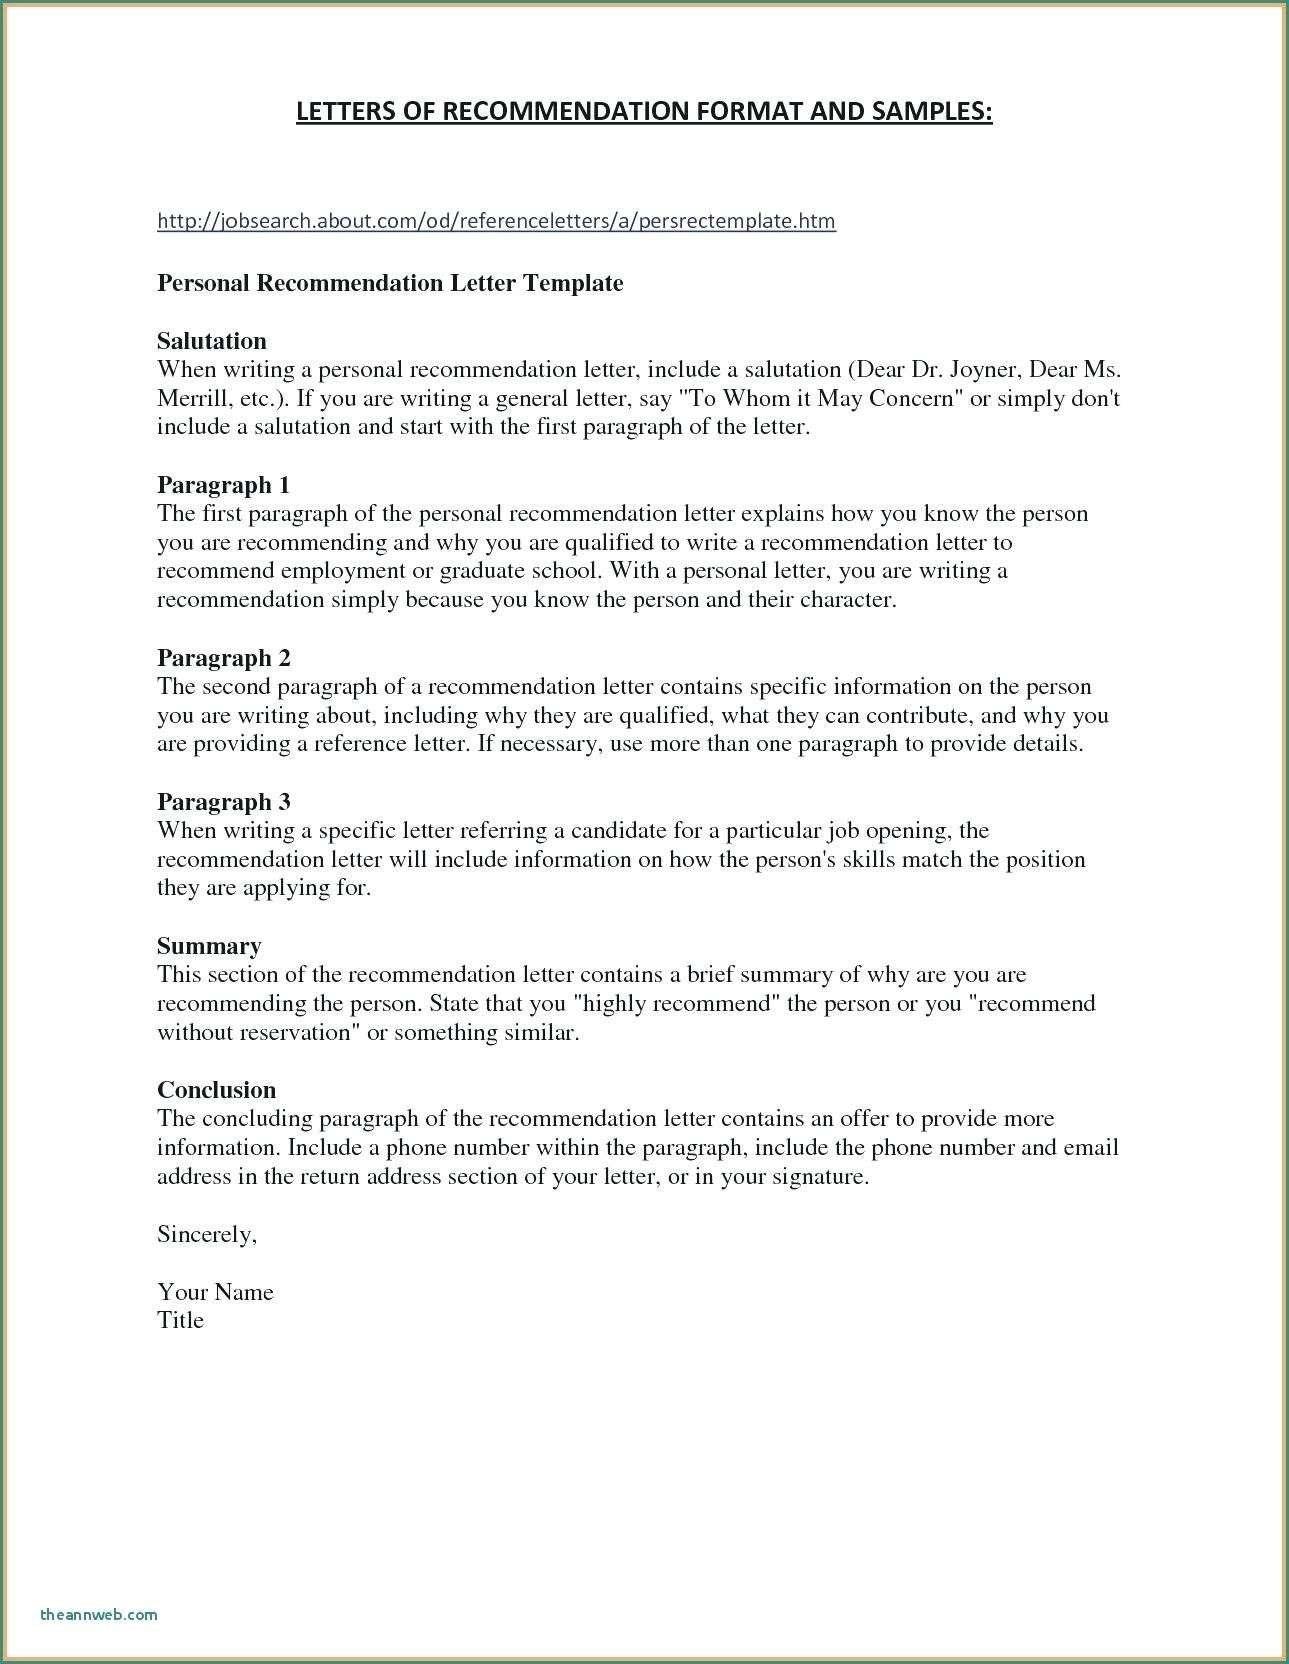 Business Partnership Letter Template  Caquetapositivo Intended For Business Partnership Proposal Letter Template